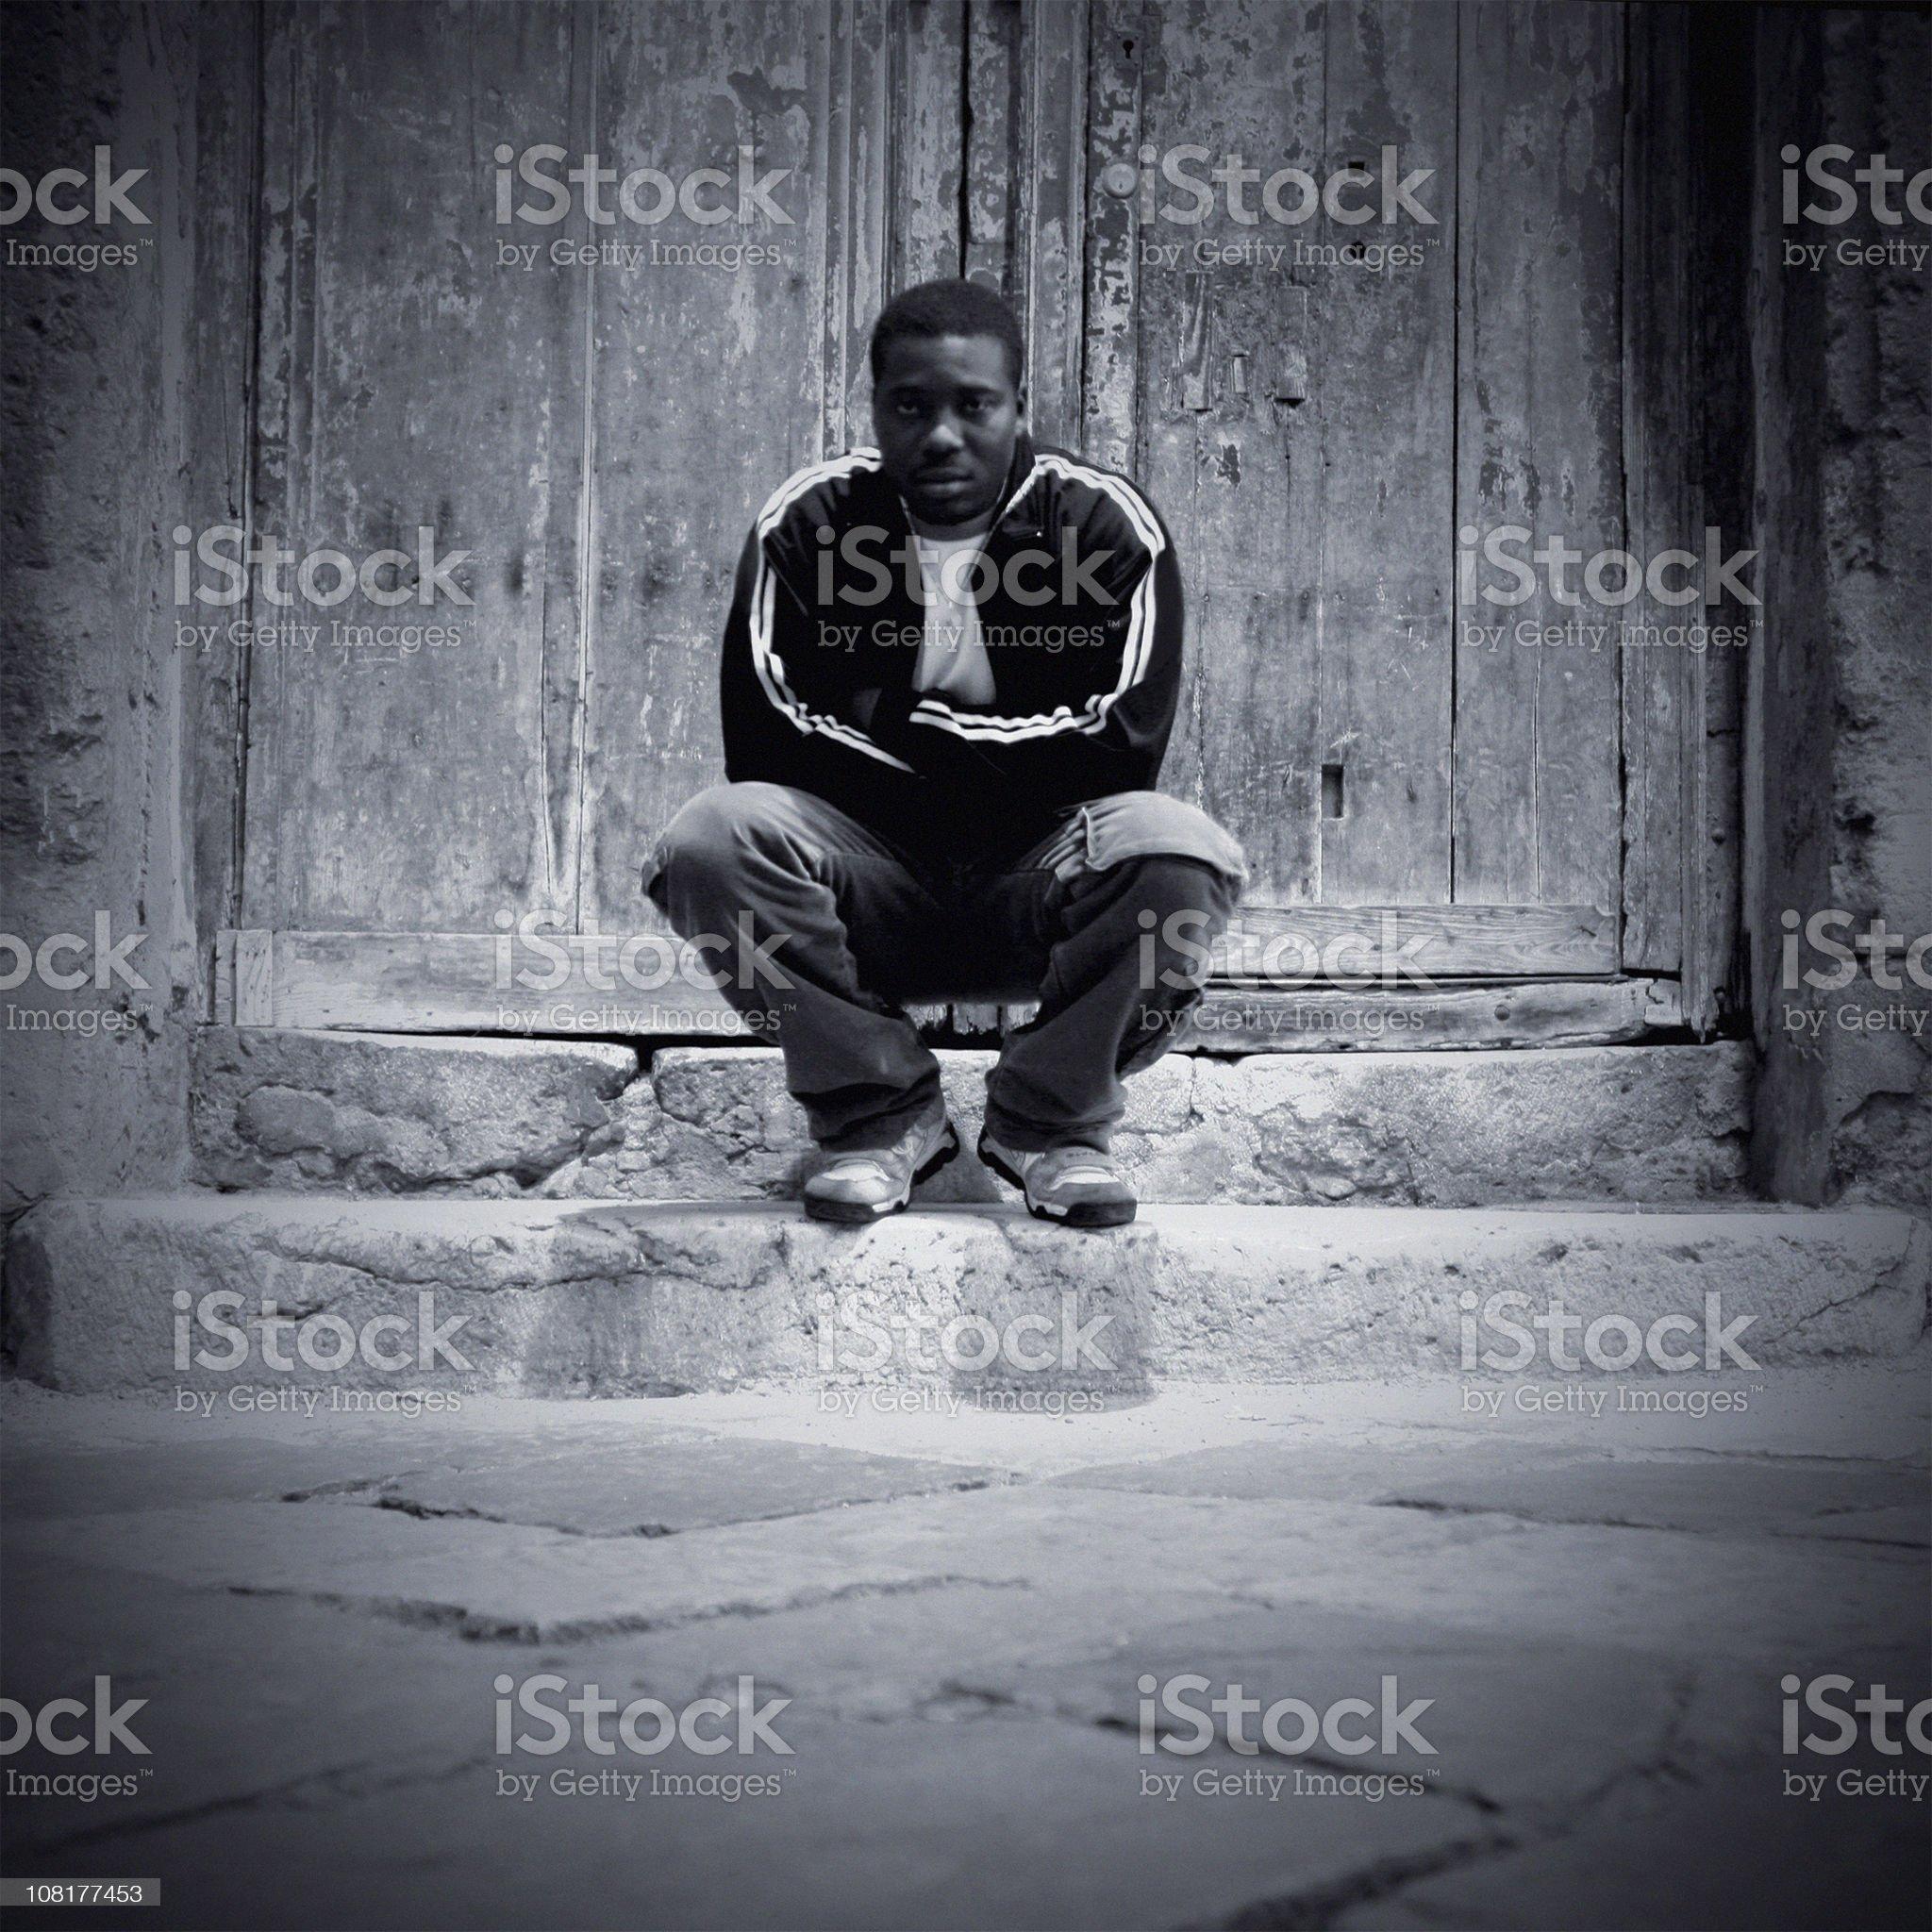 alone in the dark street royalty-free stock photo